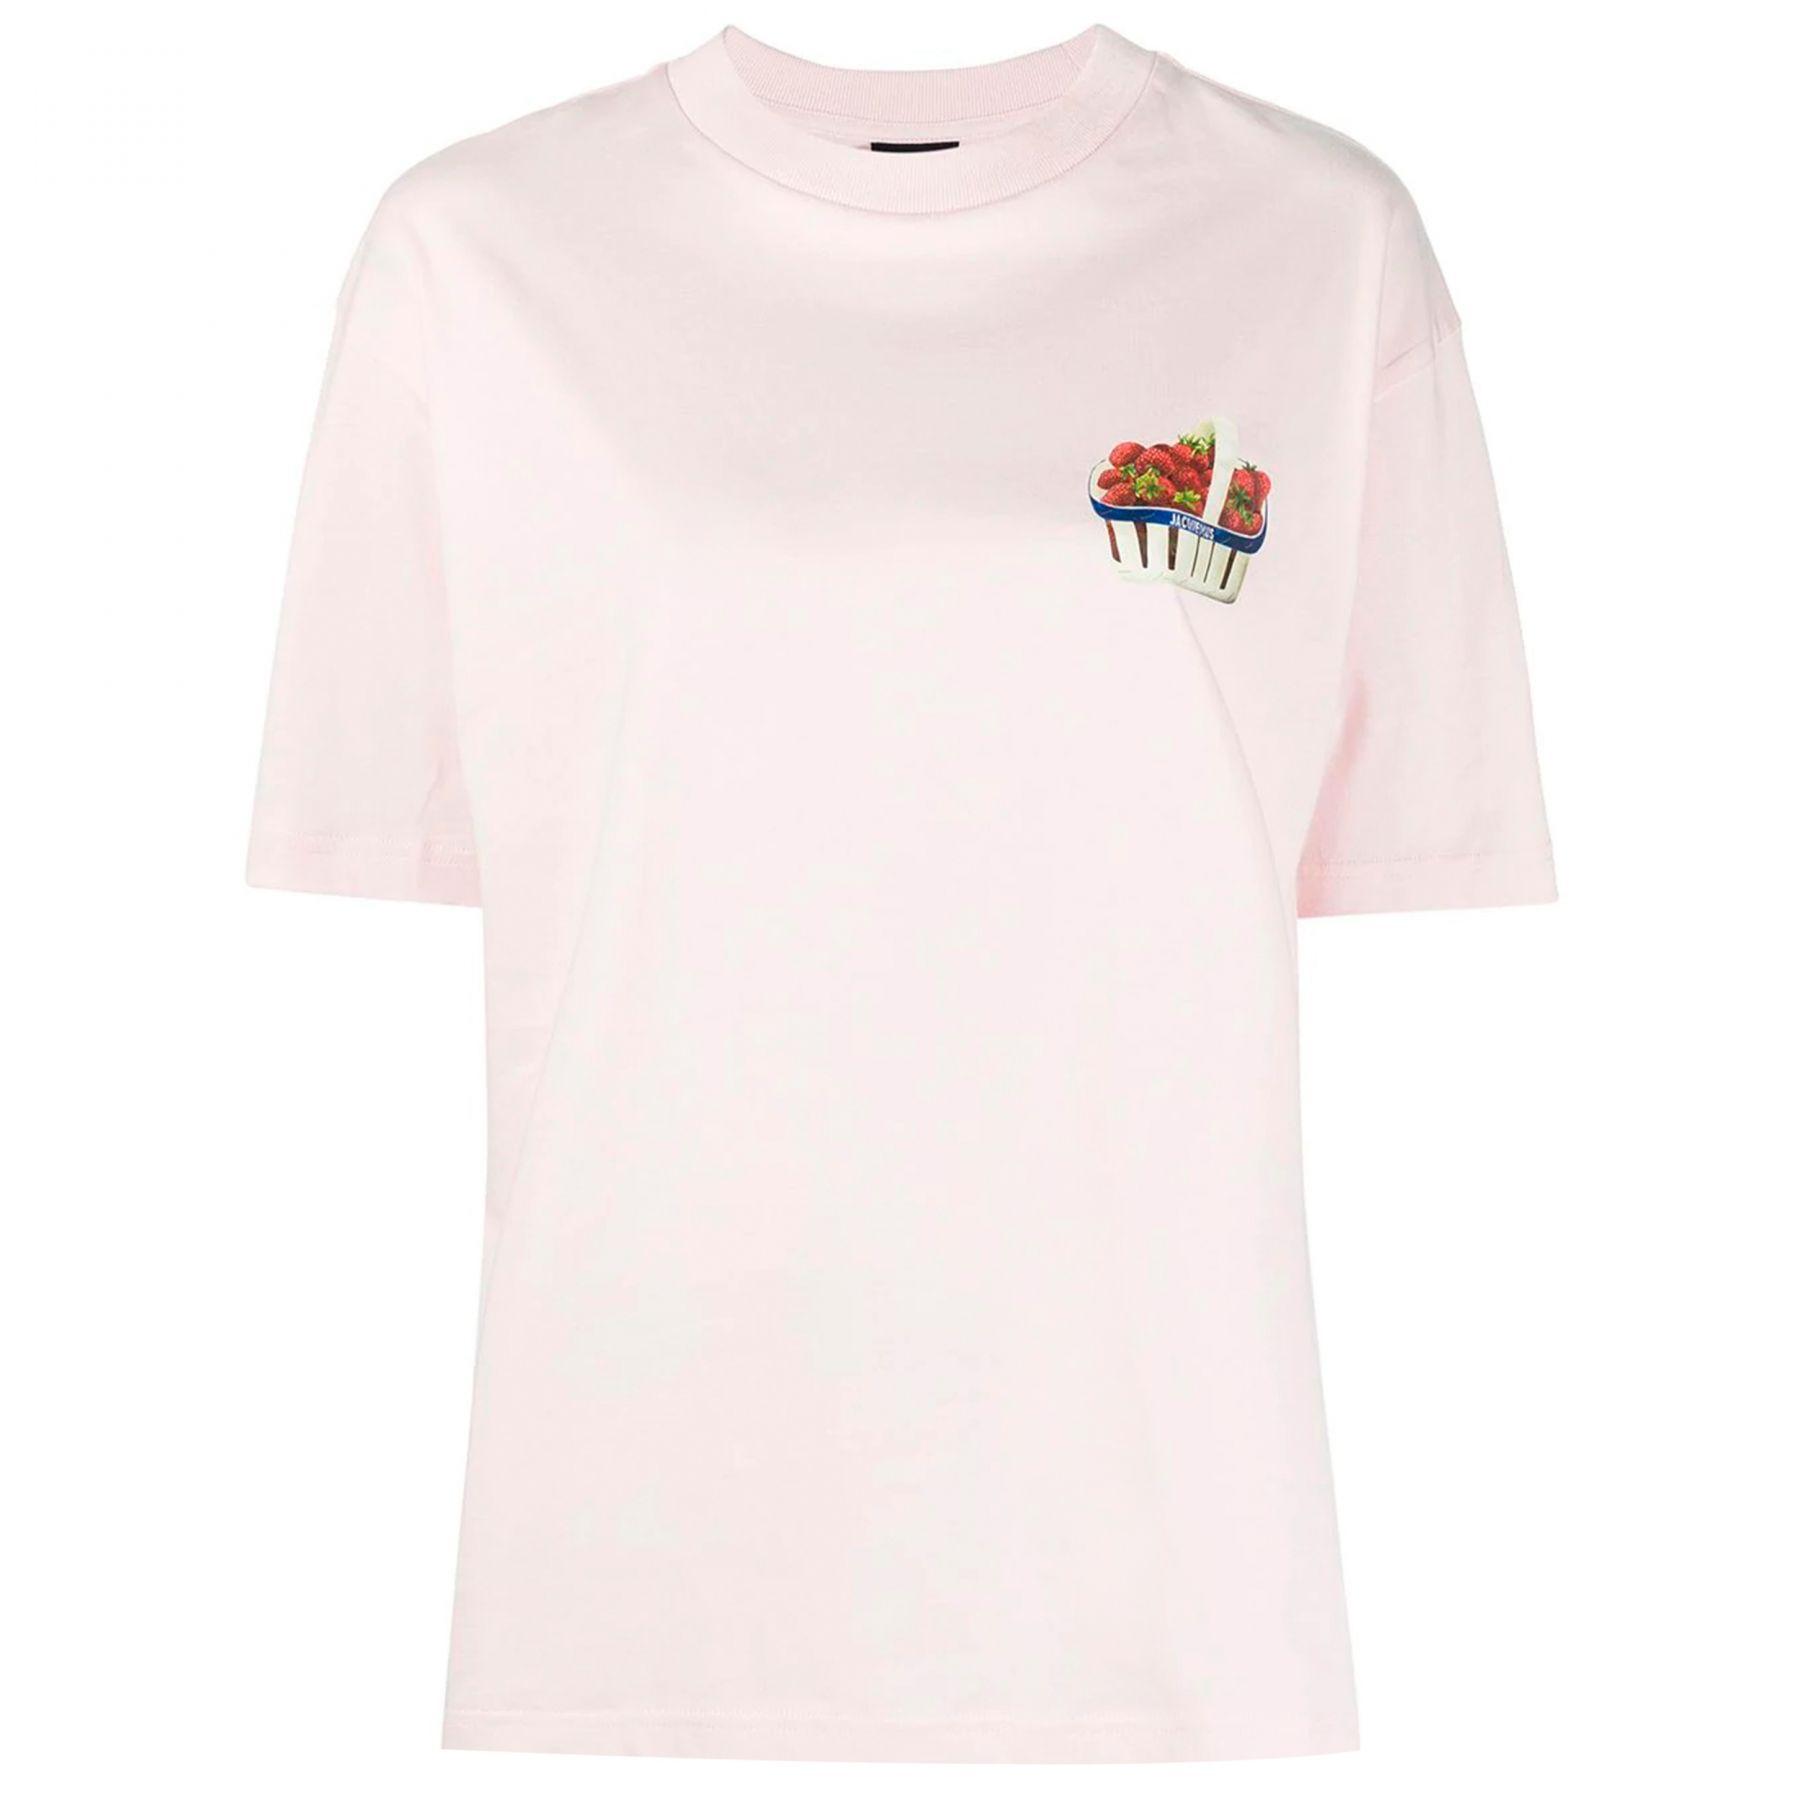 Футболка Jacquemus Fraises розовая